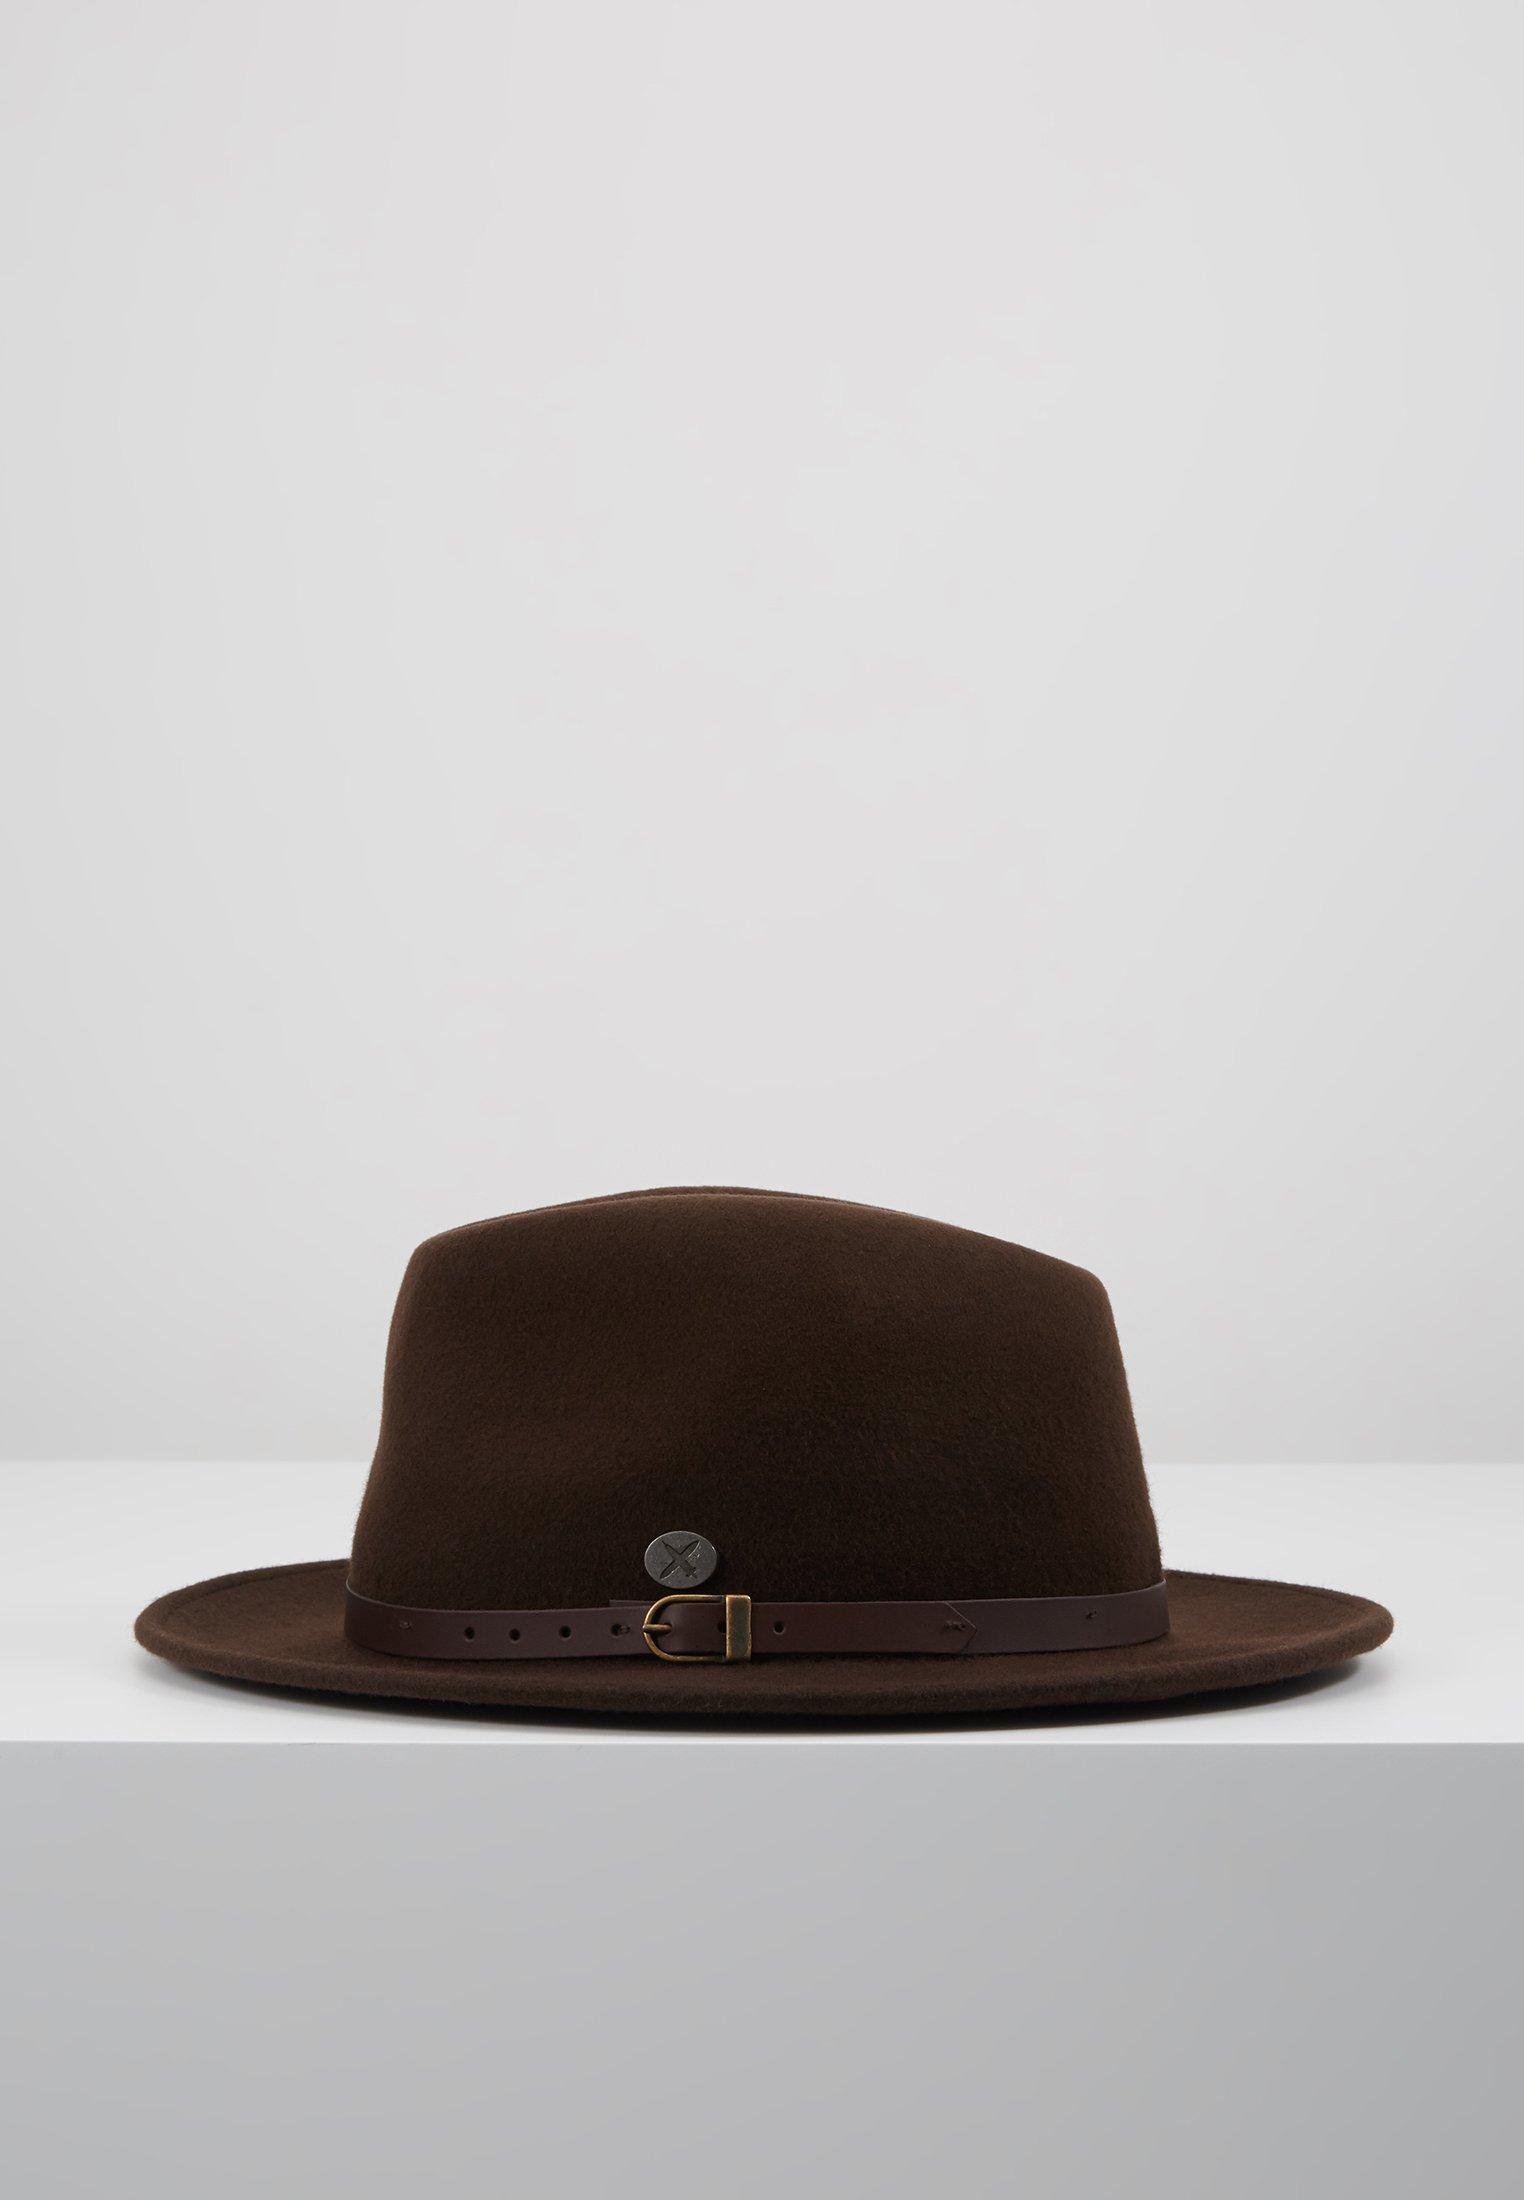 Menil ORVIETO - Hatt - brown/brun 9hXOSOjsOv42lzE